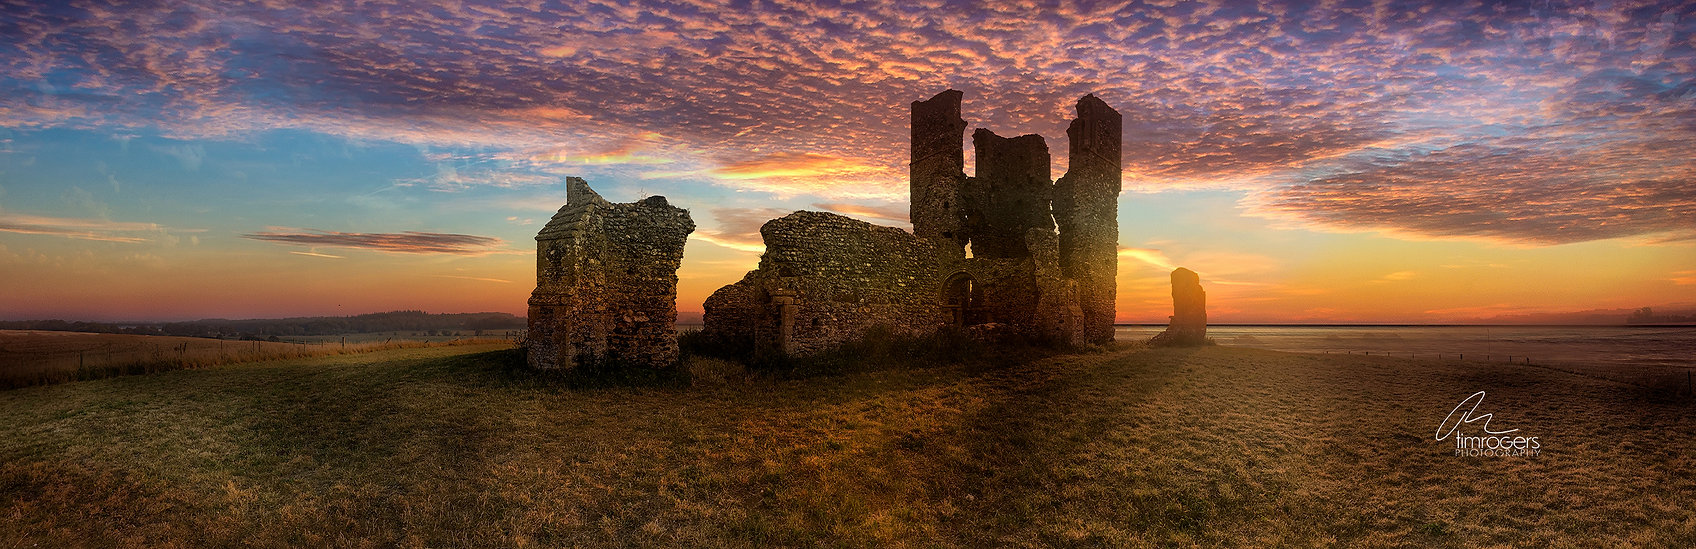 Sunrise at Bawsey Ruins (72 res).jpg